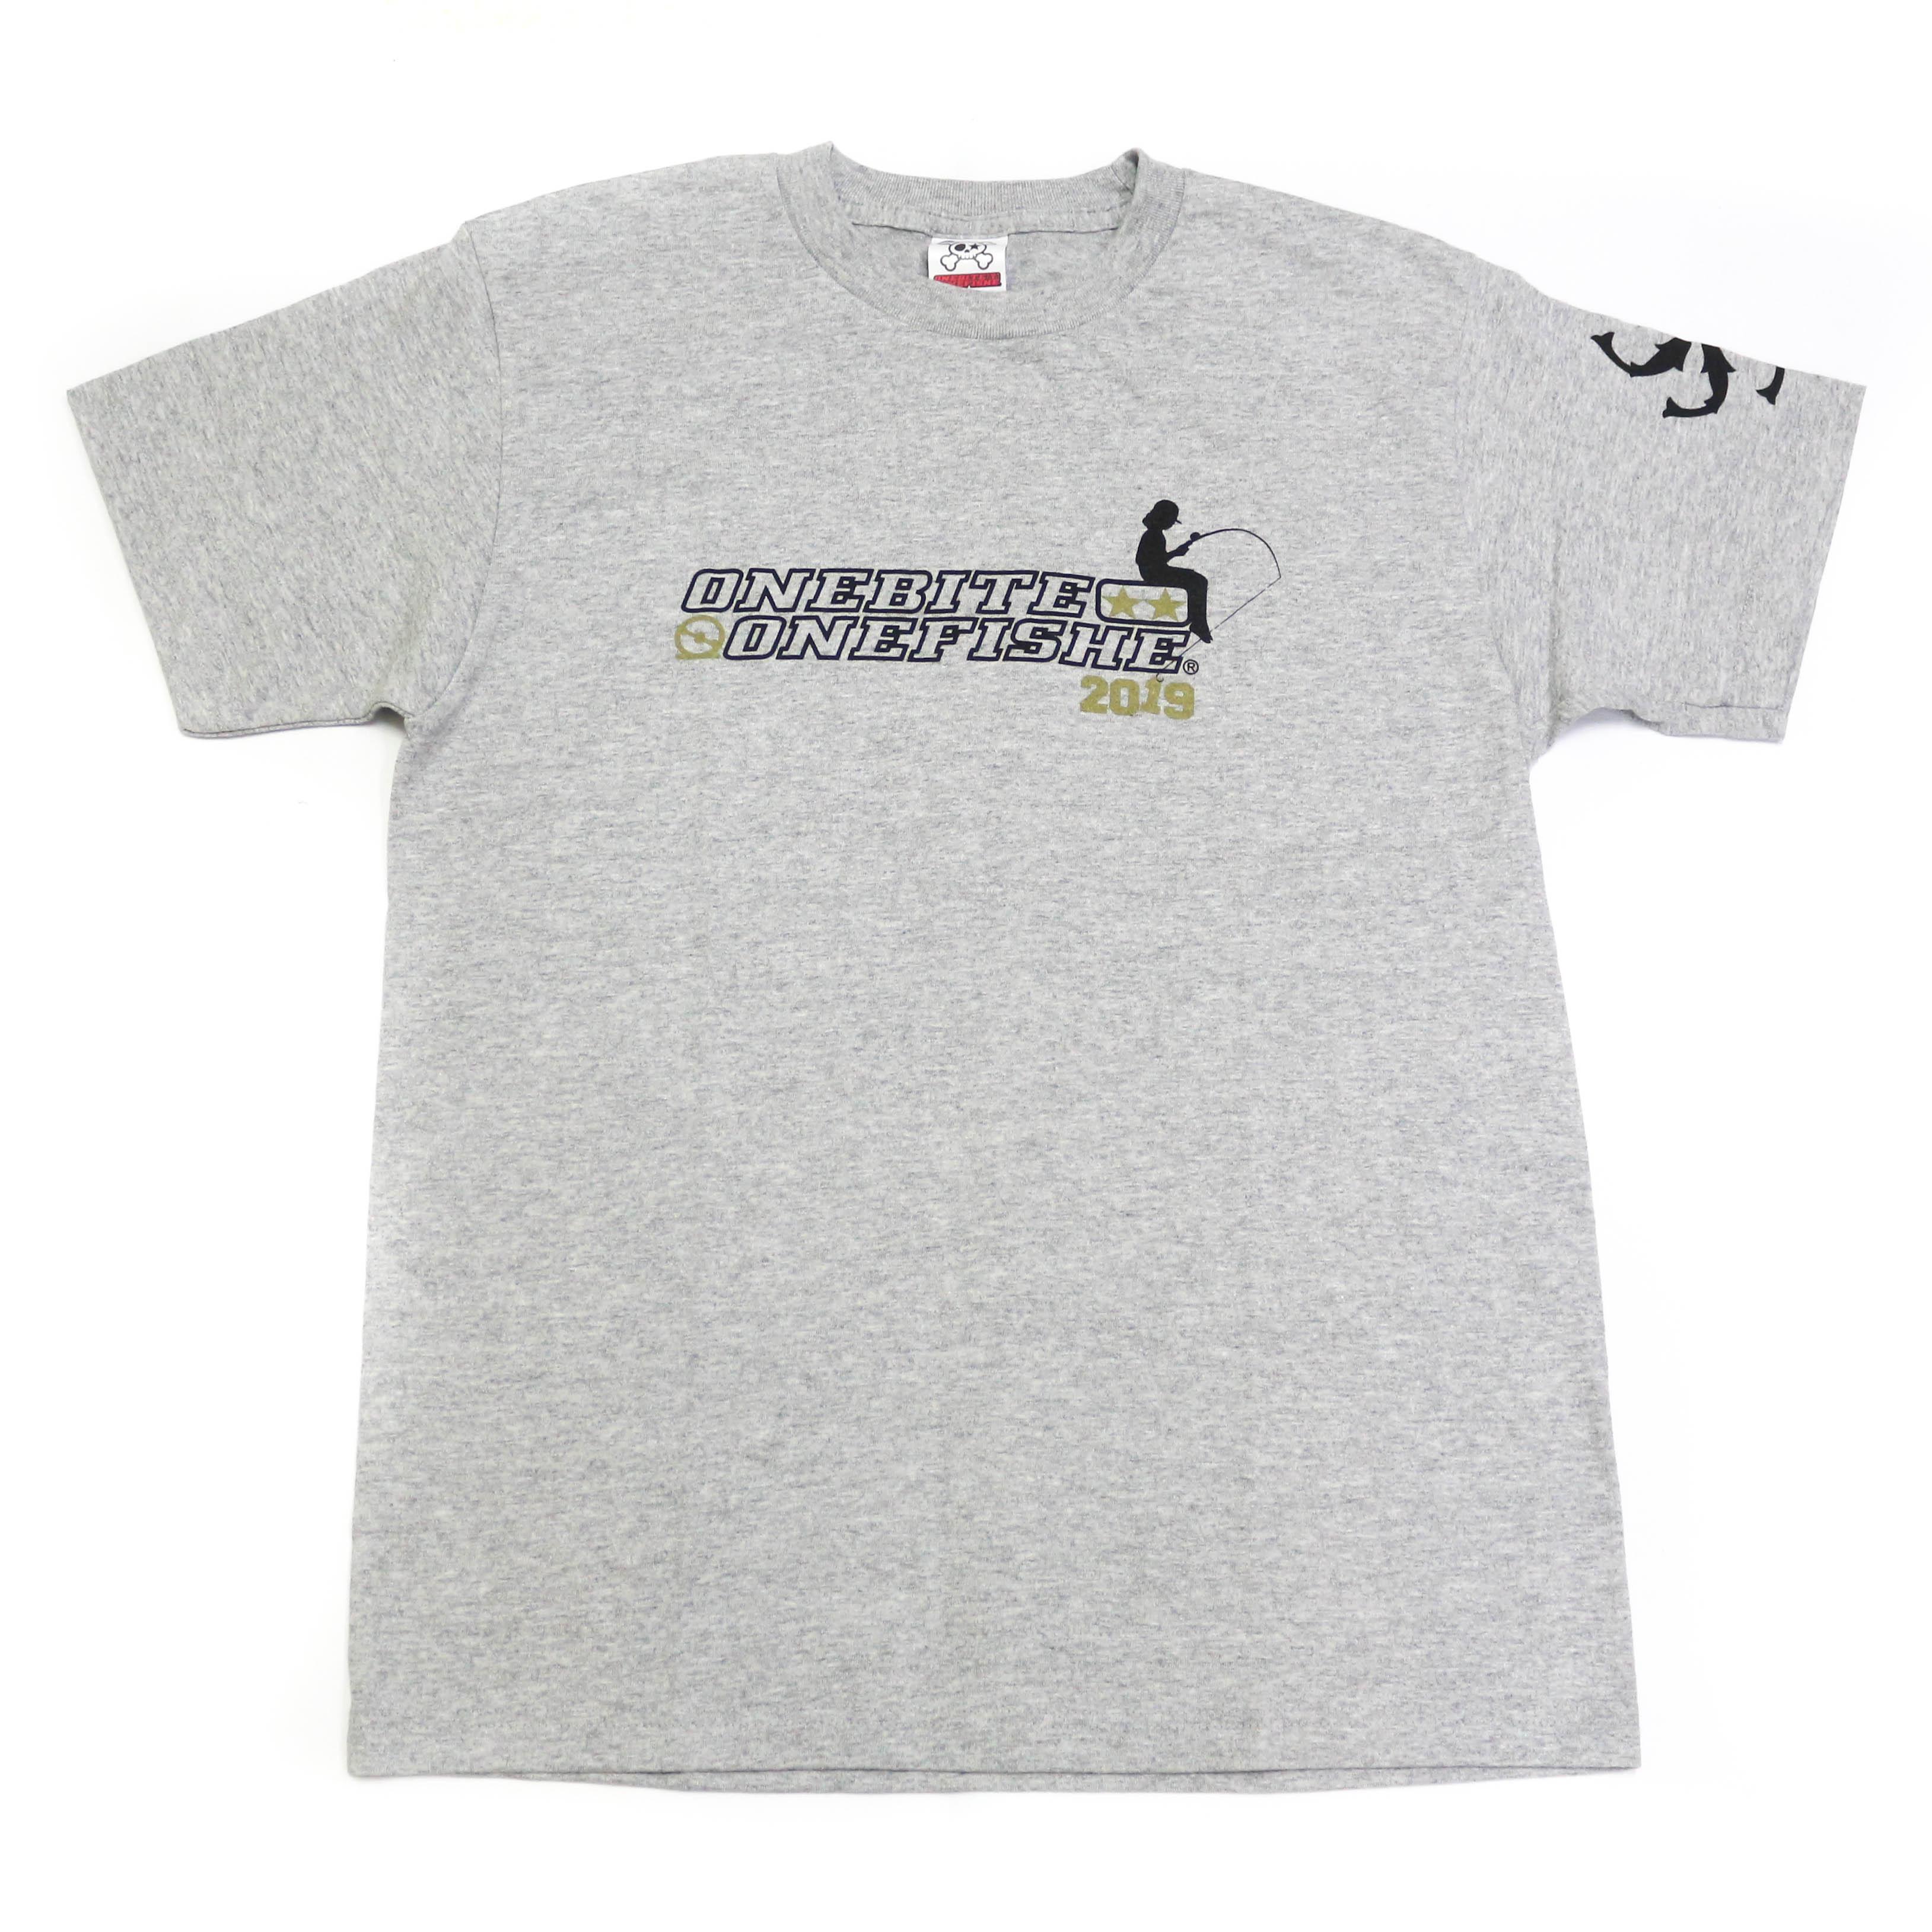 One Bite One Fish OBOF T-Shirt 2019 Short Sleeve Ash Gray Size M (2013)